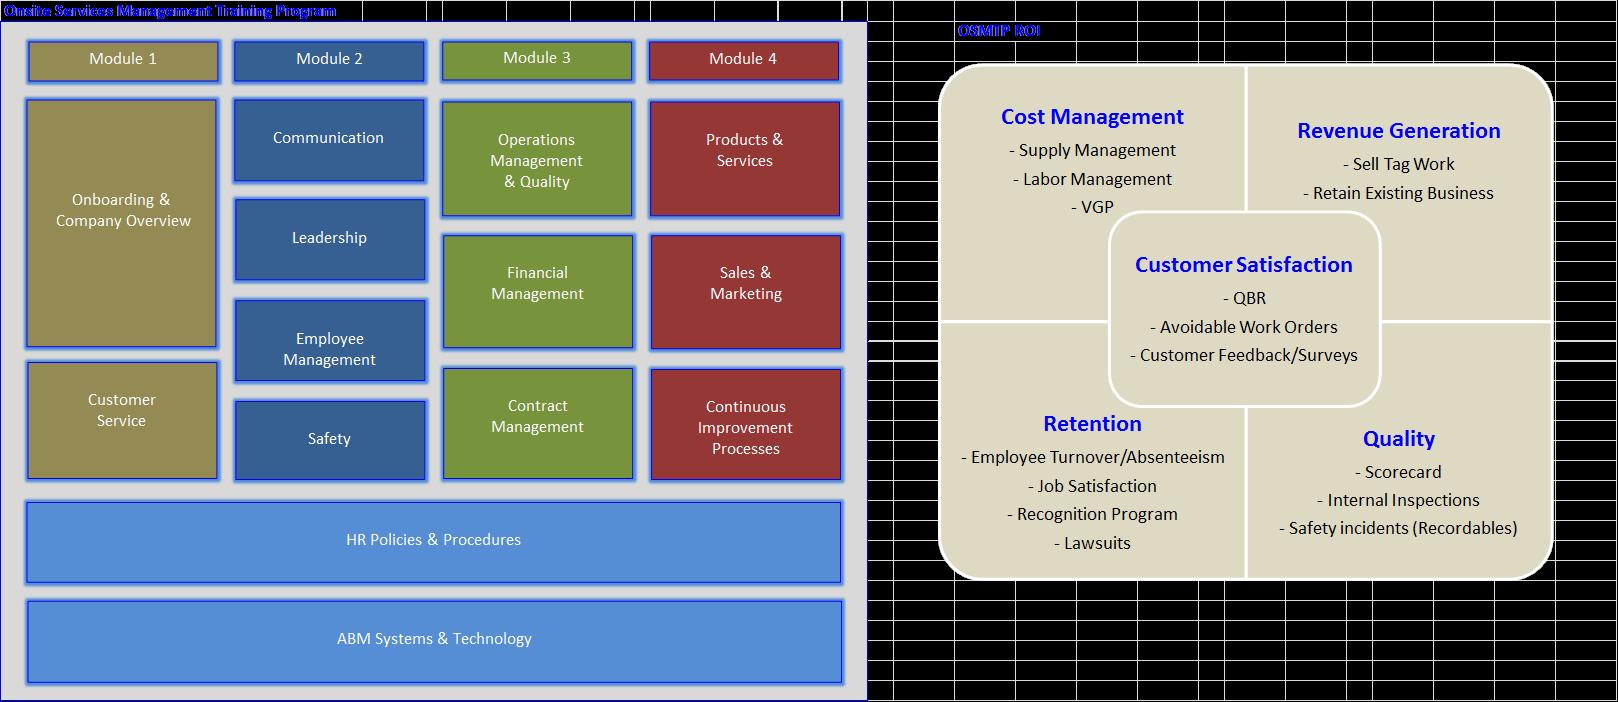 OnSite management training Q4 FY2013